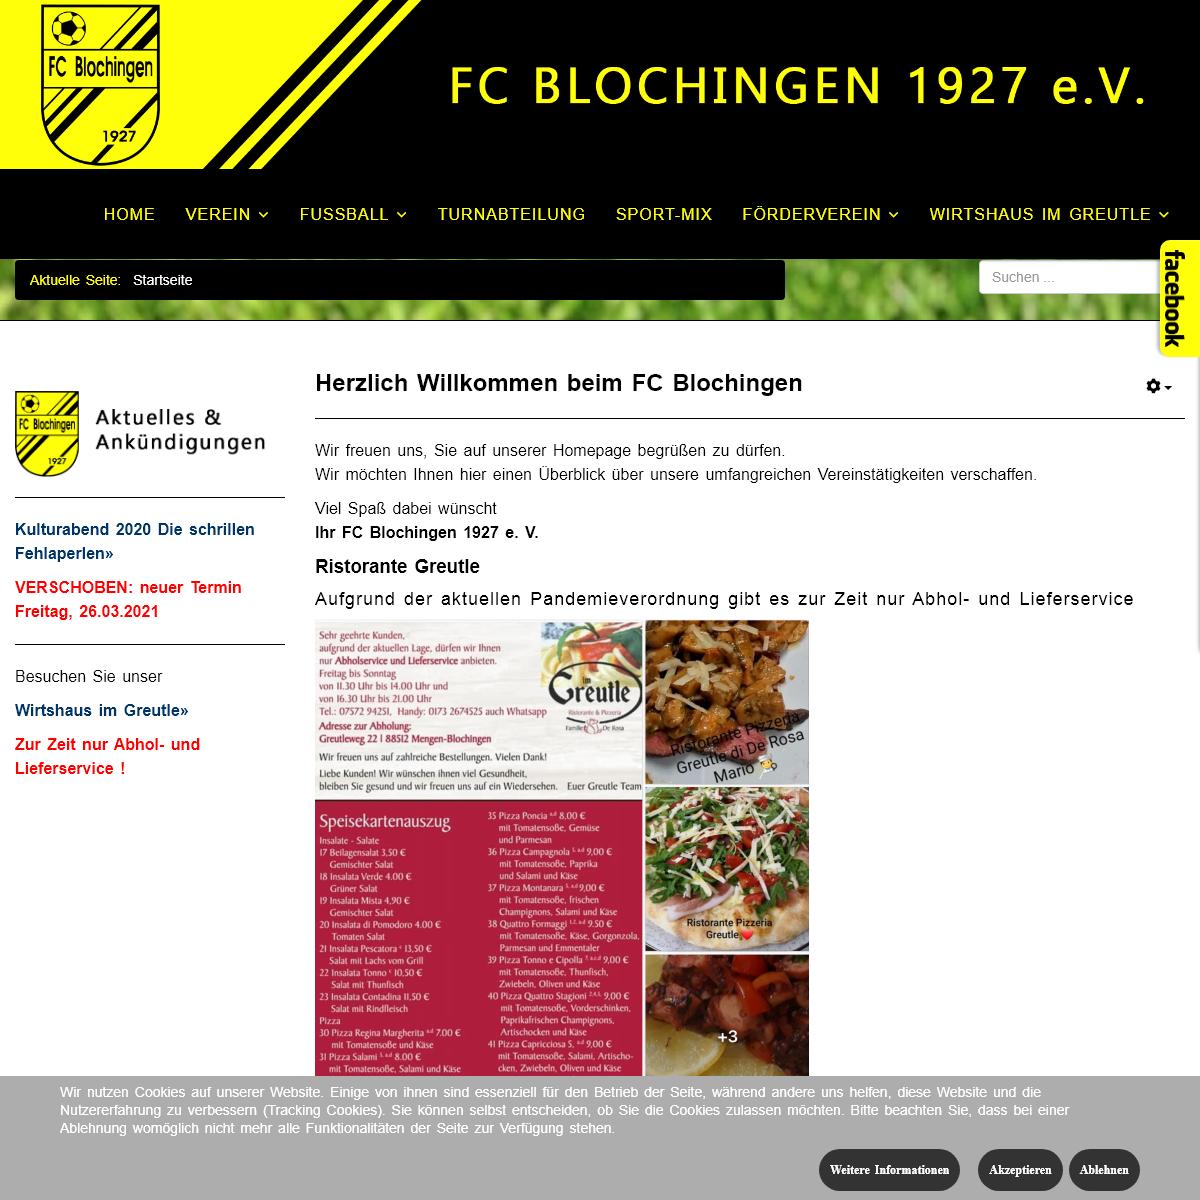 A complete backup of fcblochingen.de